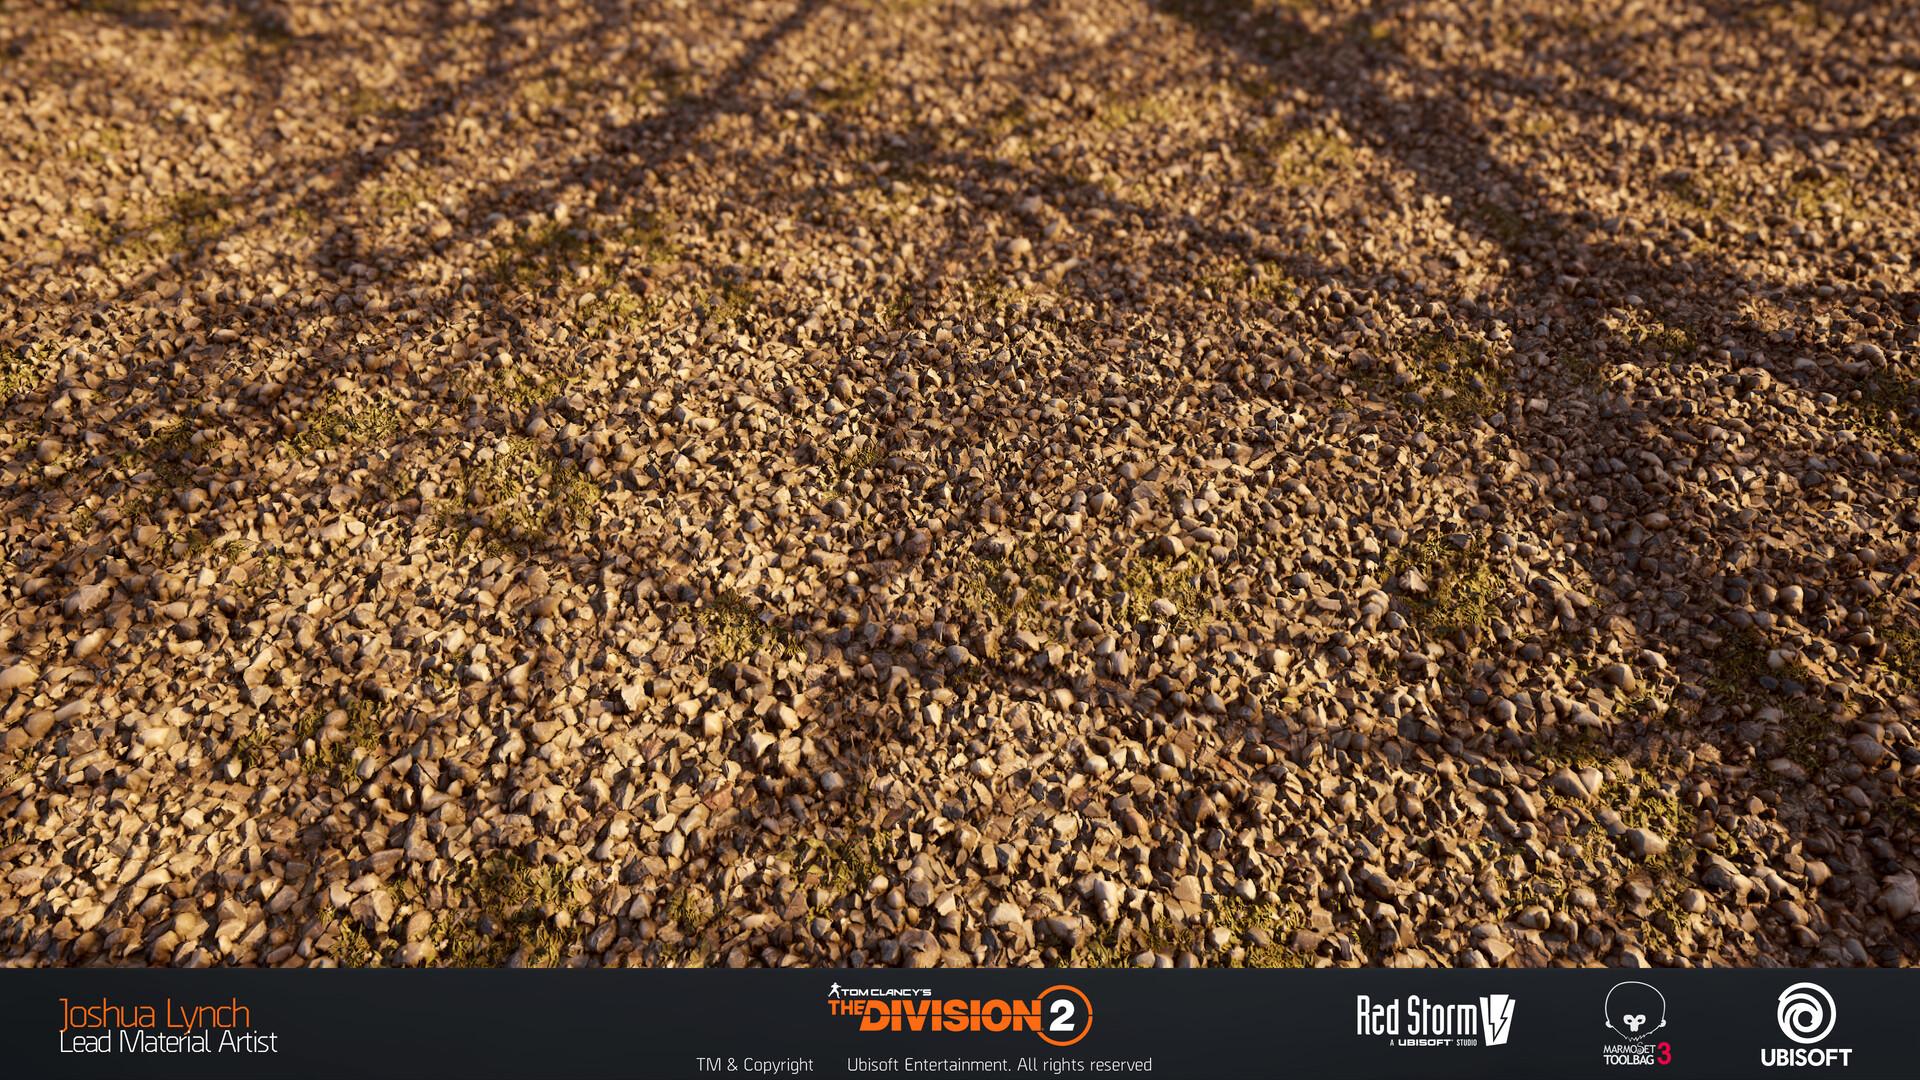 Joshua lynch division 2 josh lynch soil gravel 03 ground